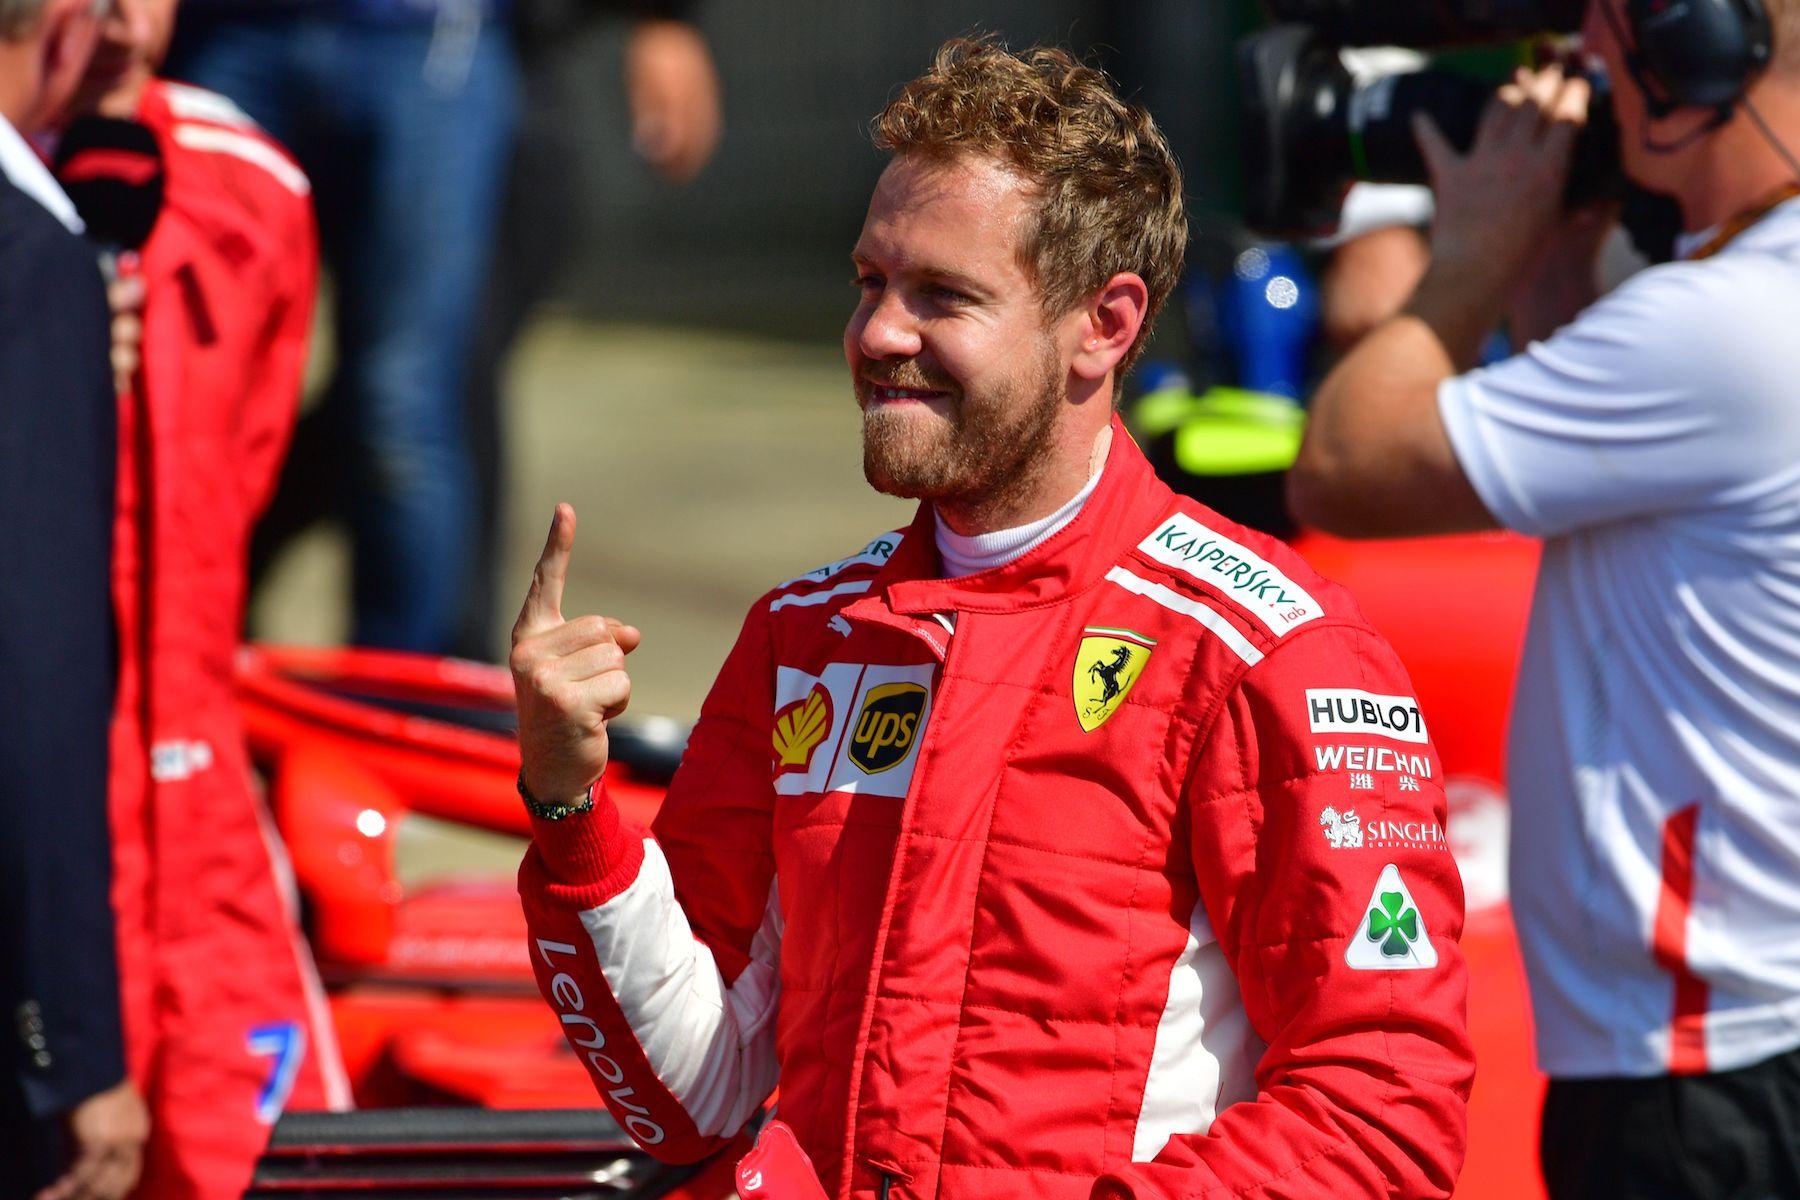 W 2018 Sebastian Vettel | Ferrari SF71H | 2018 British GP winner 3 copy.jpg